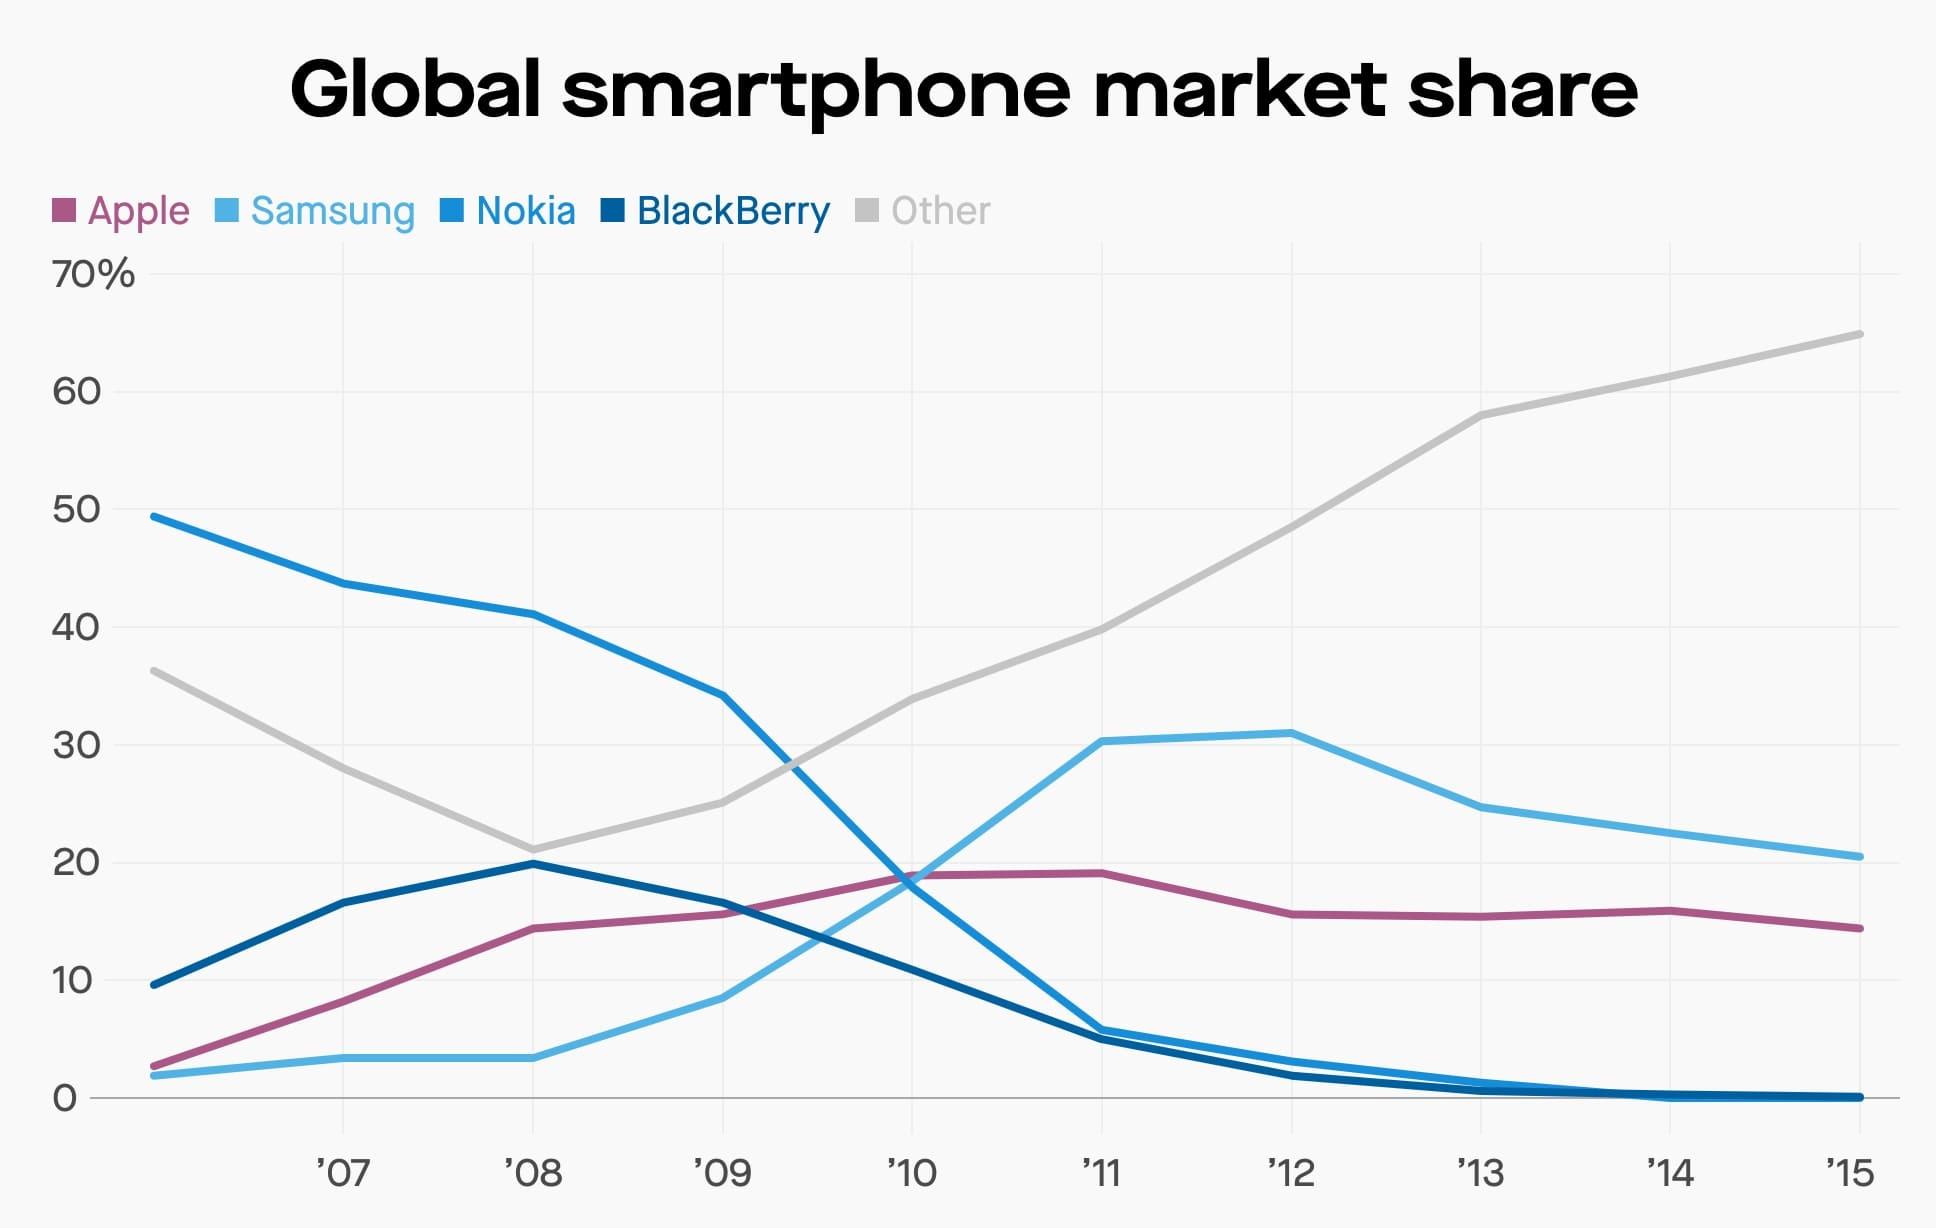 Global smartphones market share graph